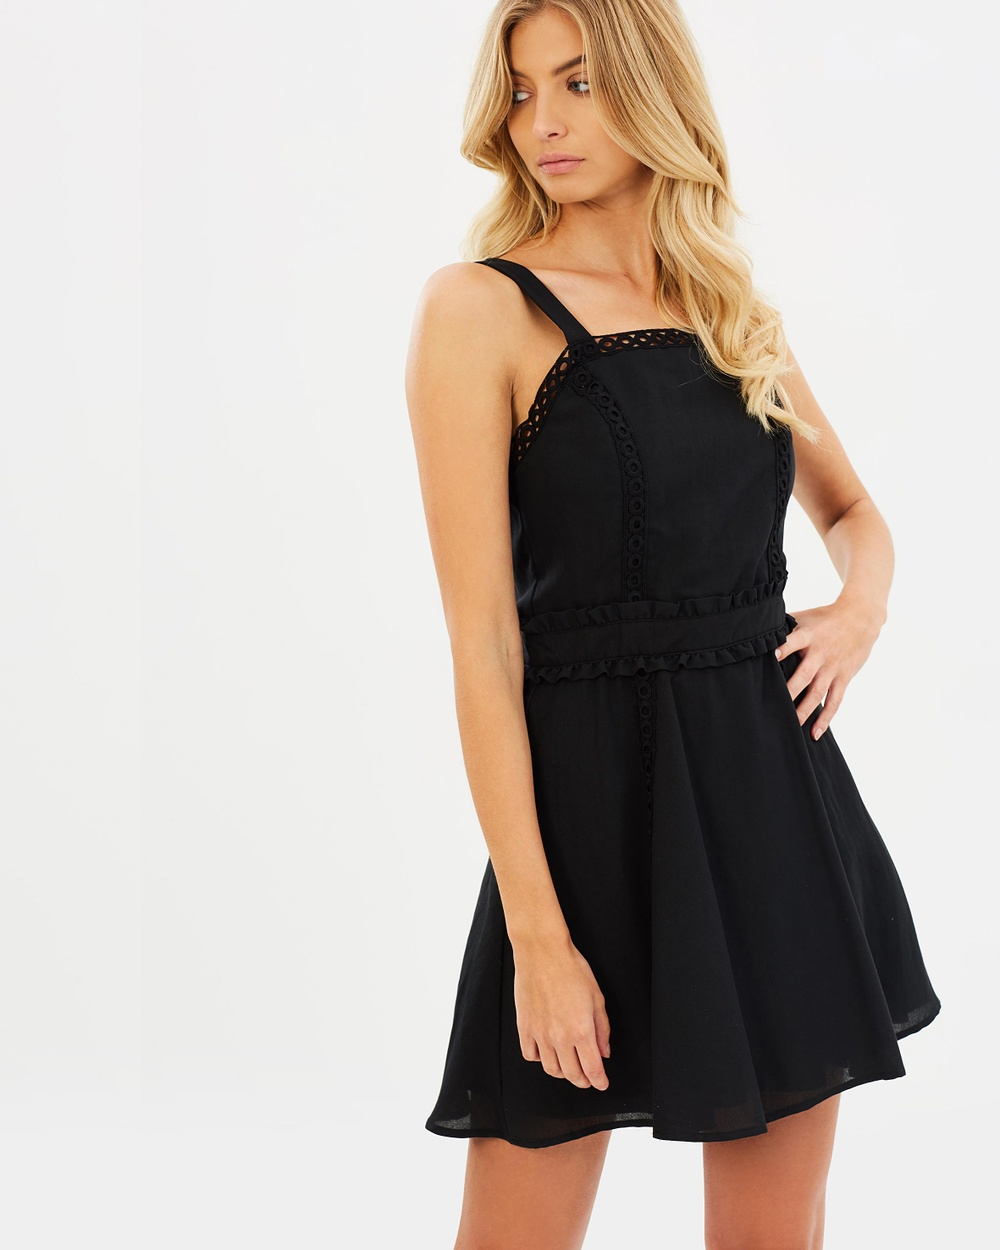 Atmos & Here ICONIC EXCLUSIVE Brandy Mini Dress Dresses Black ICONIC EXCLUSIVE Brandy Mini Dress